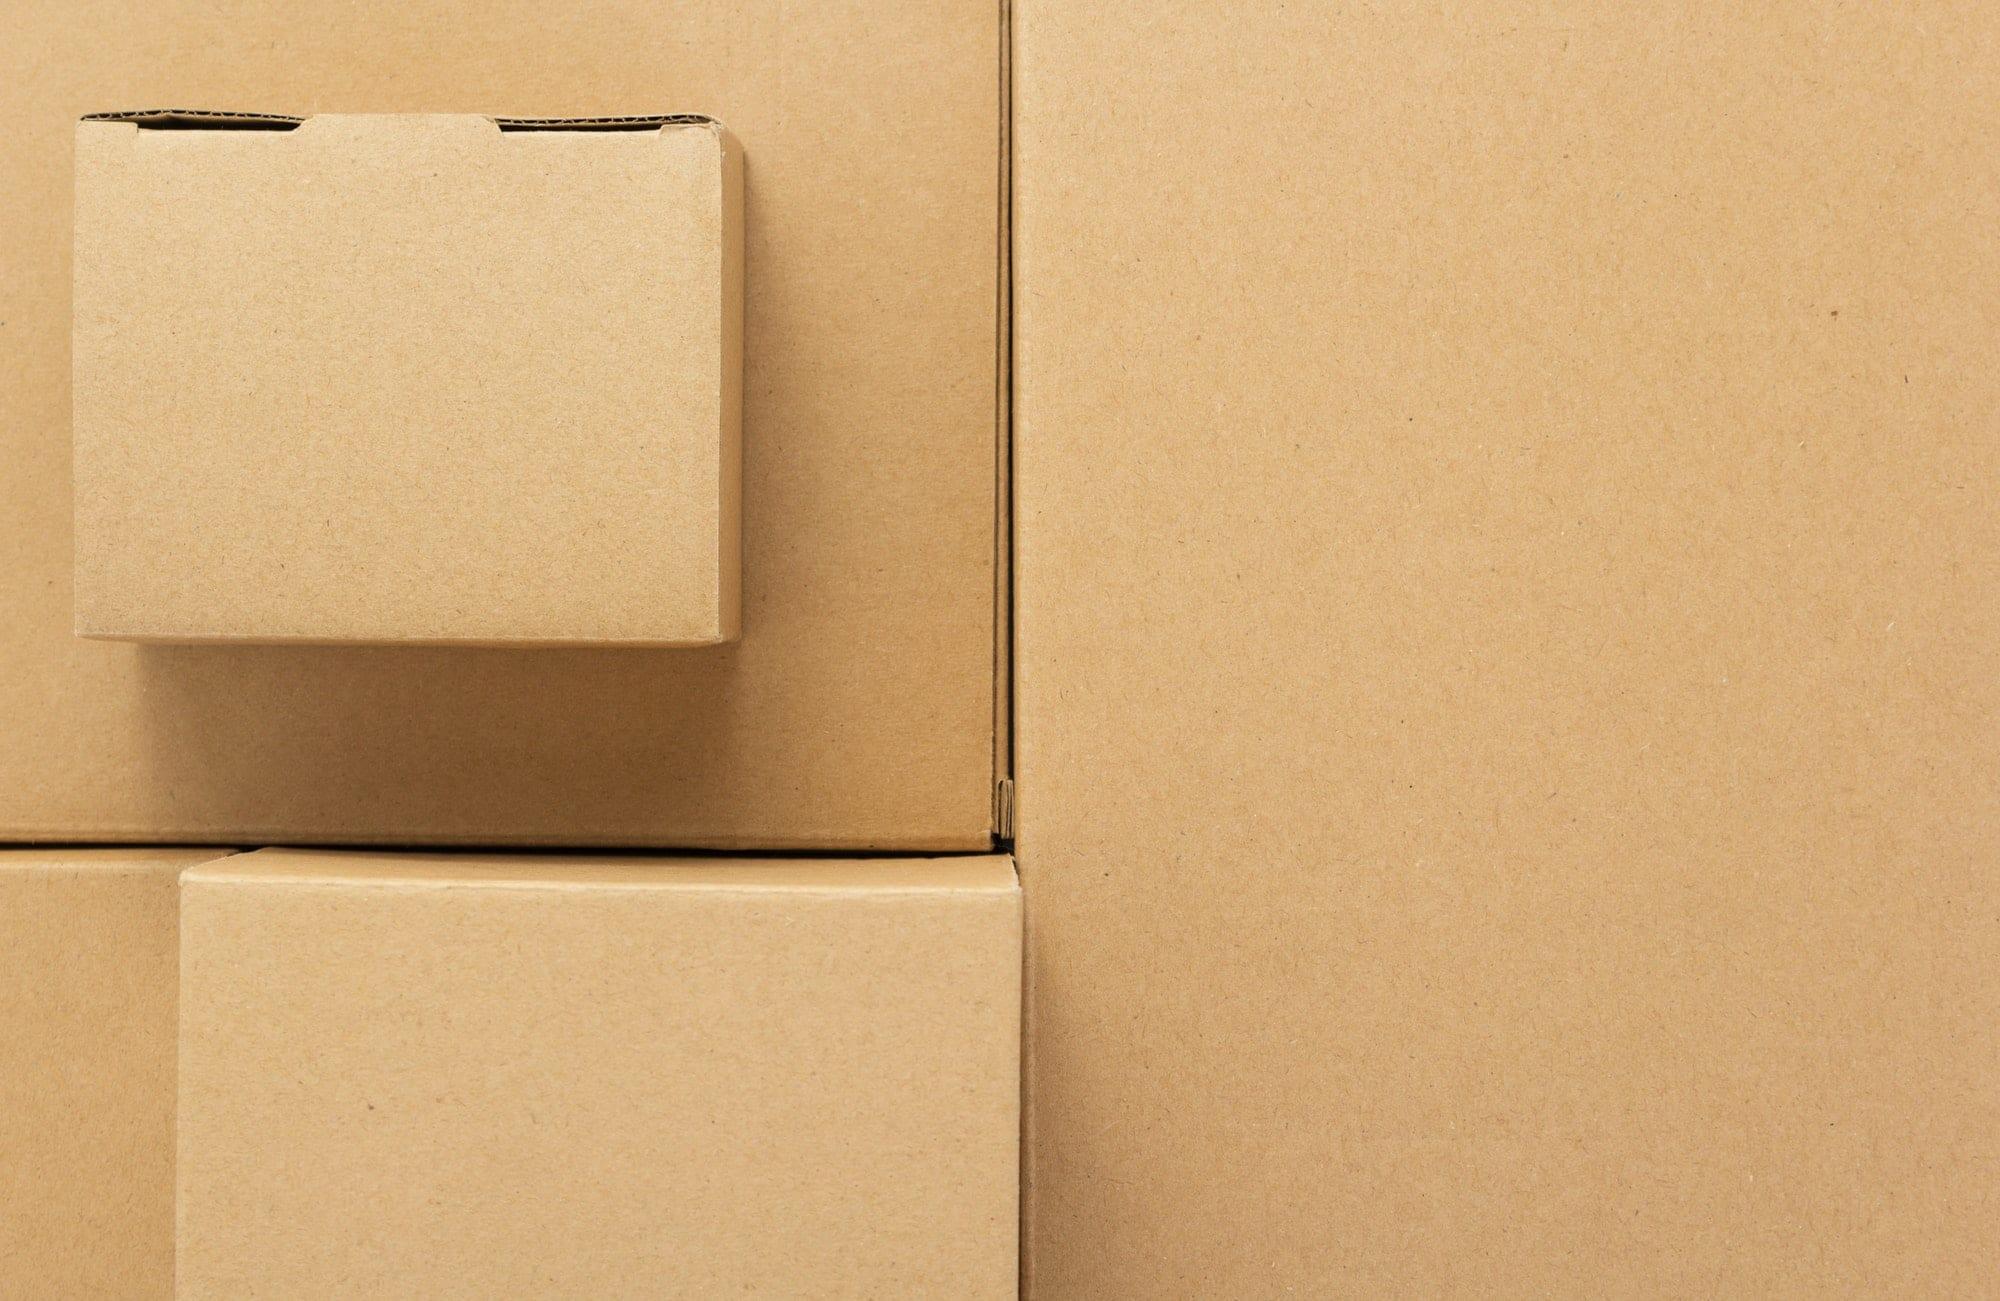 cardboard box as background